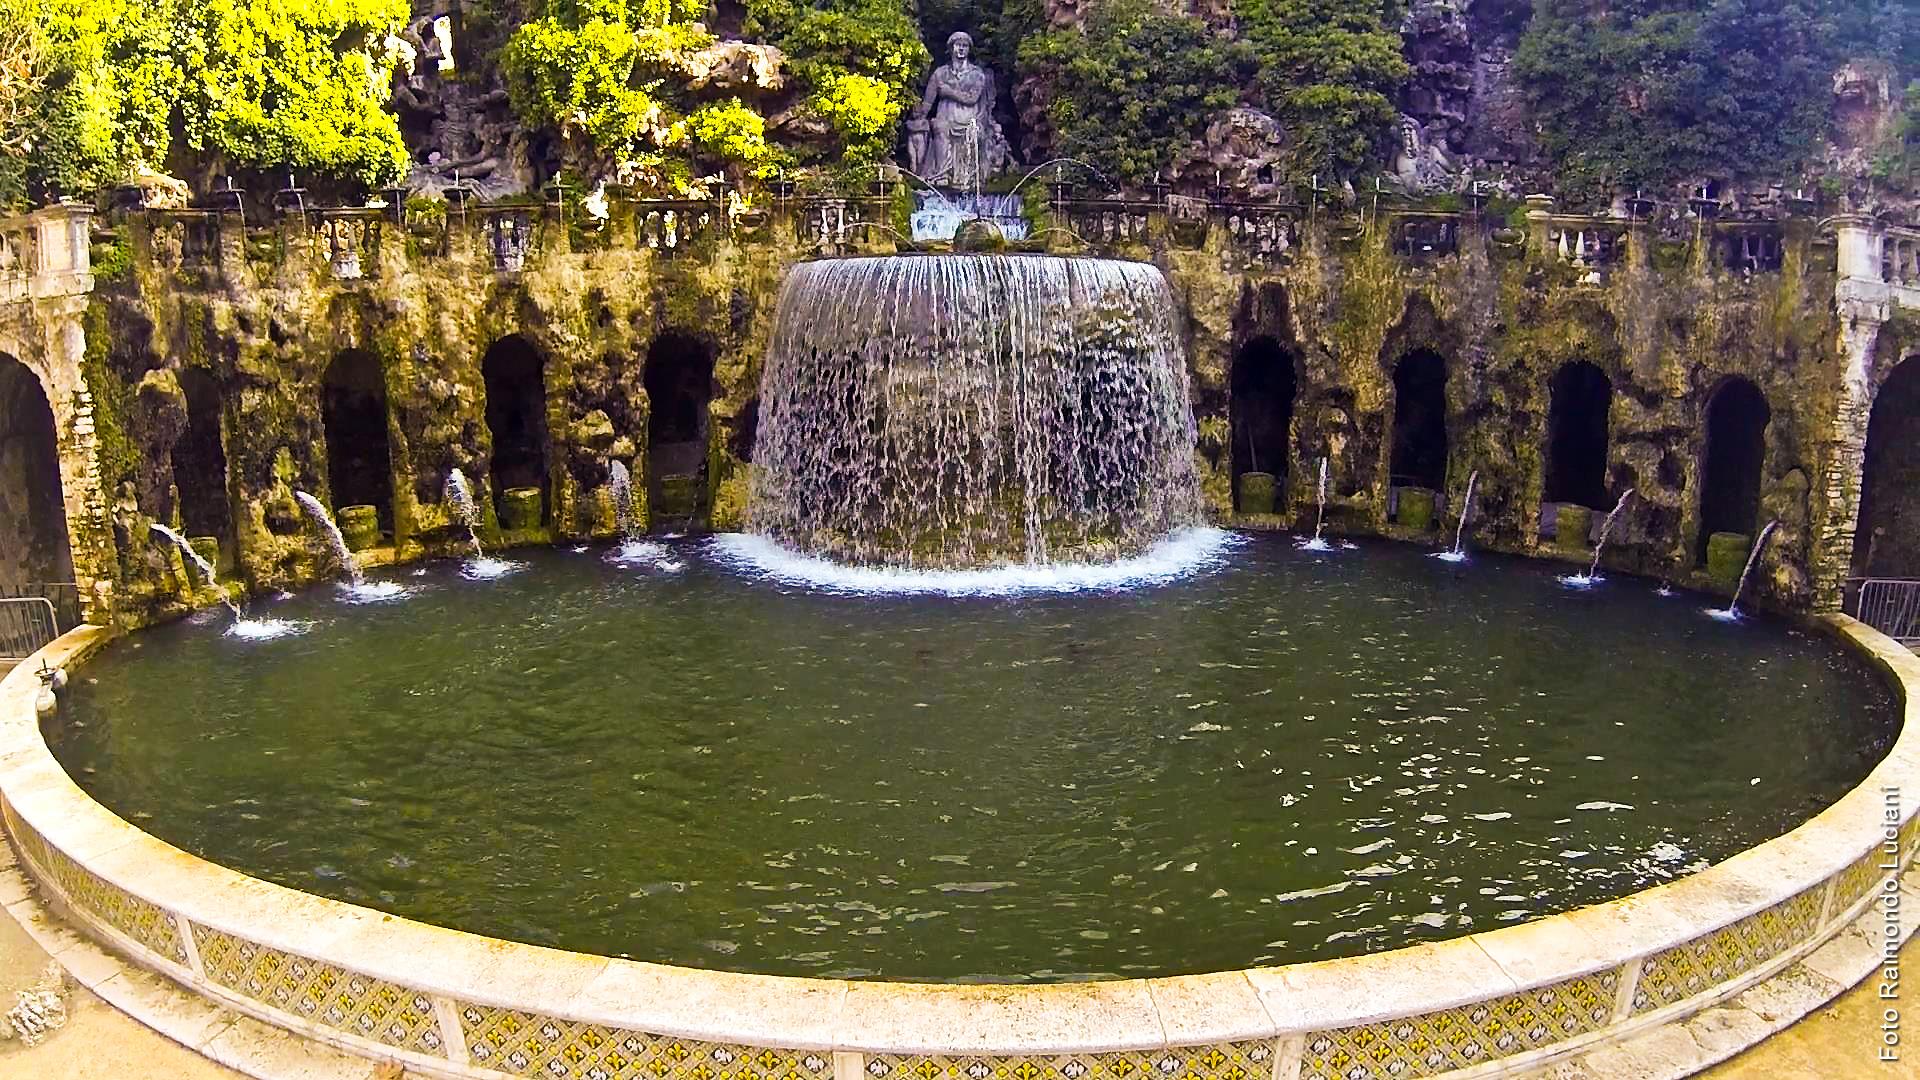 Vialetto giardino e cascate artificiali da giardino - Cascate da giardino ...